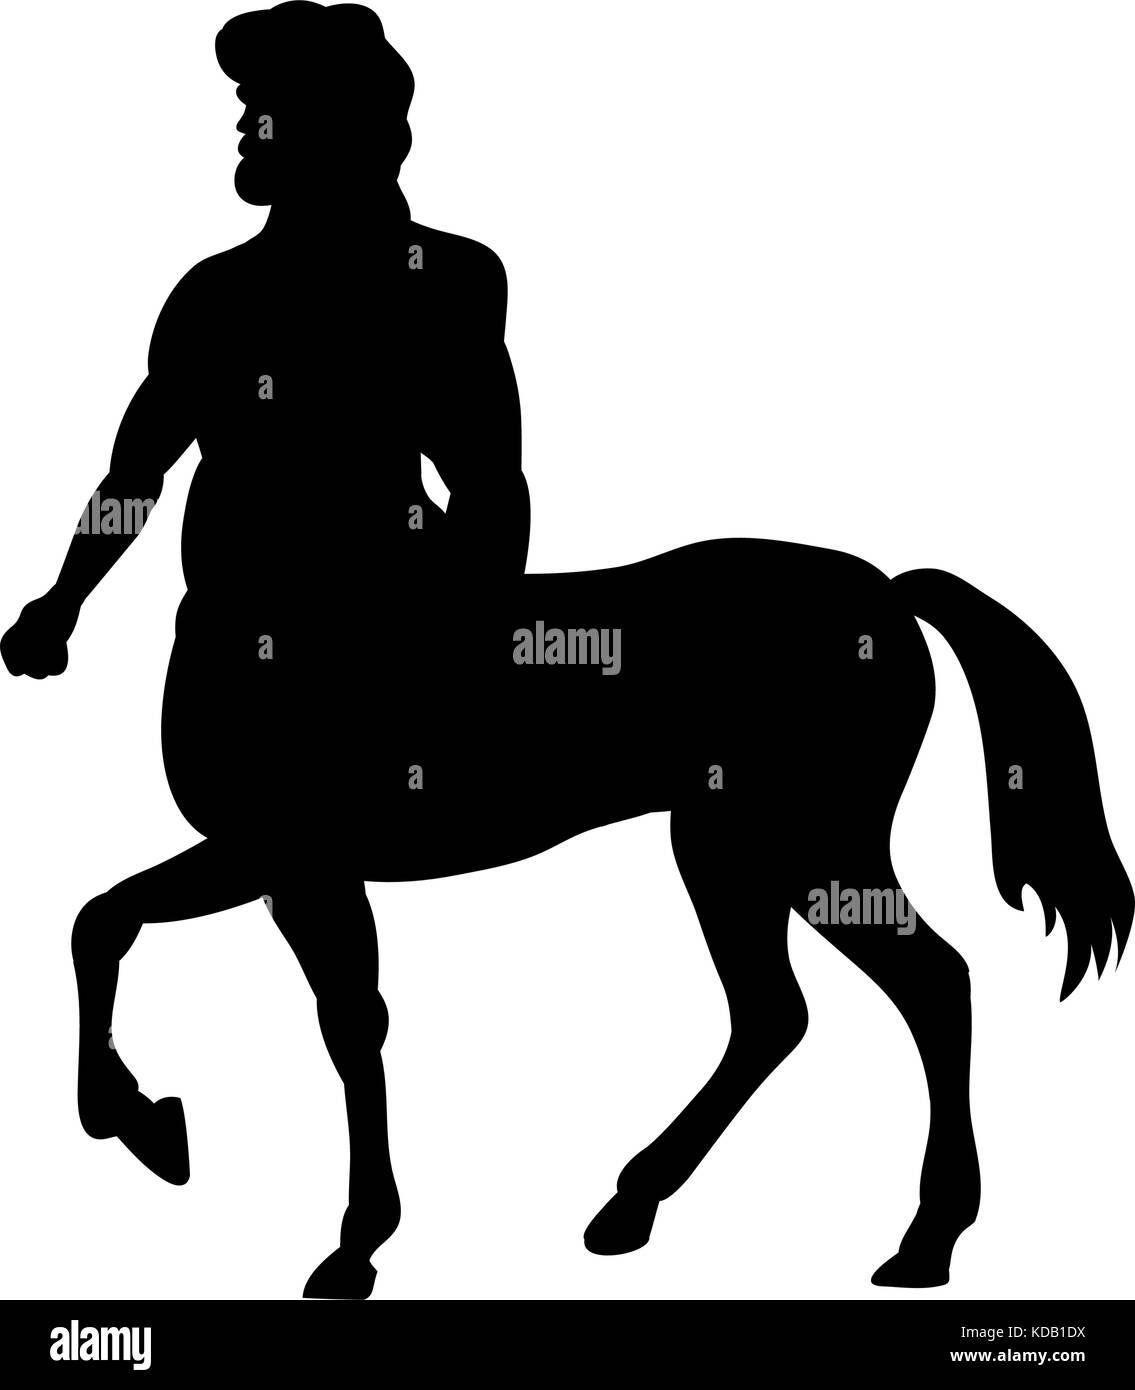 Centaur silhouette ancient mythology fantasy. Vector illustration. - Stock Vector